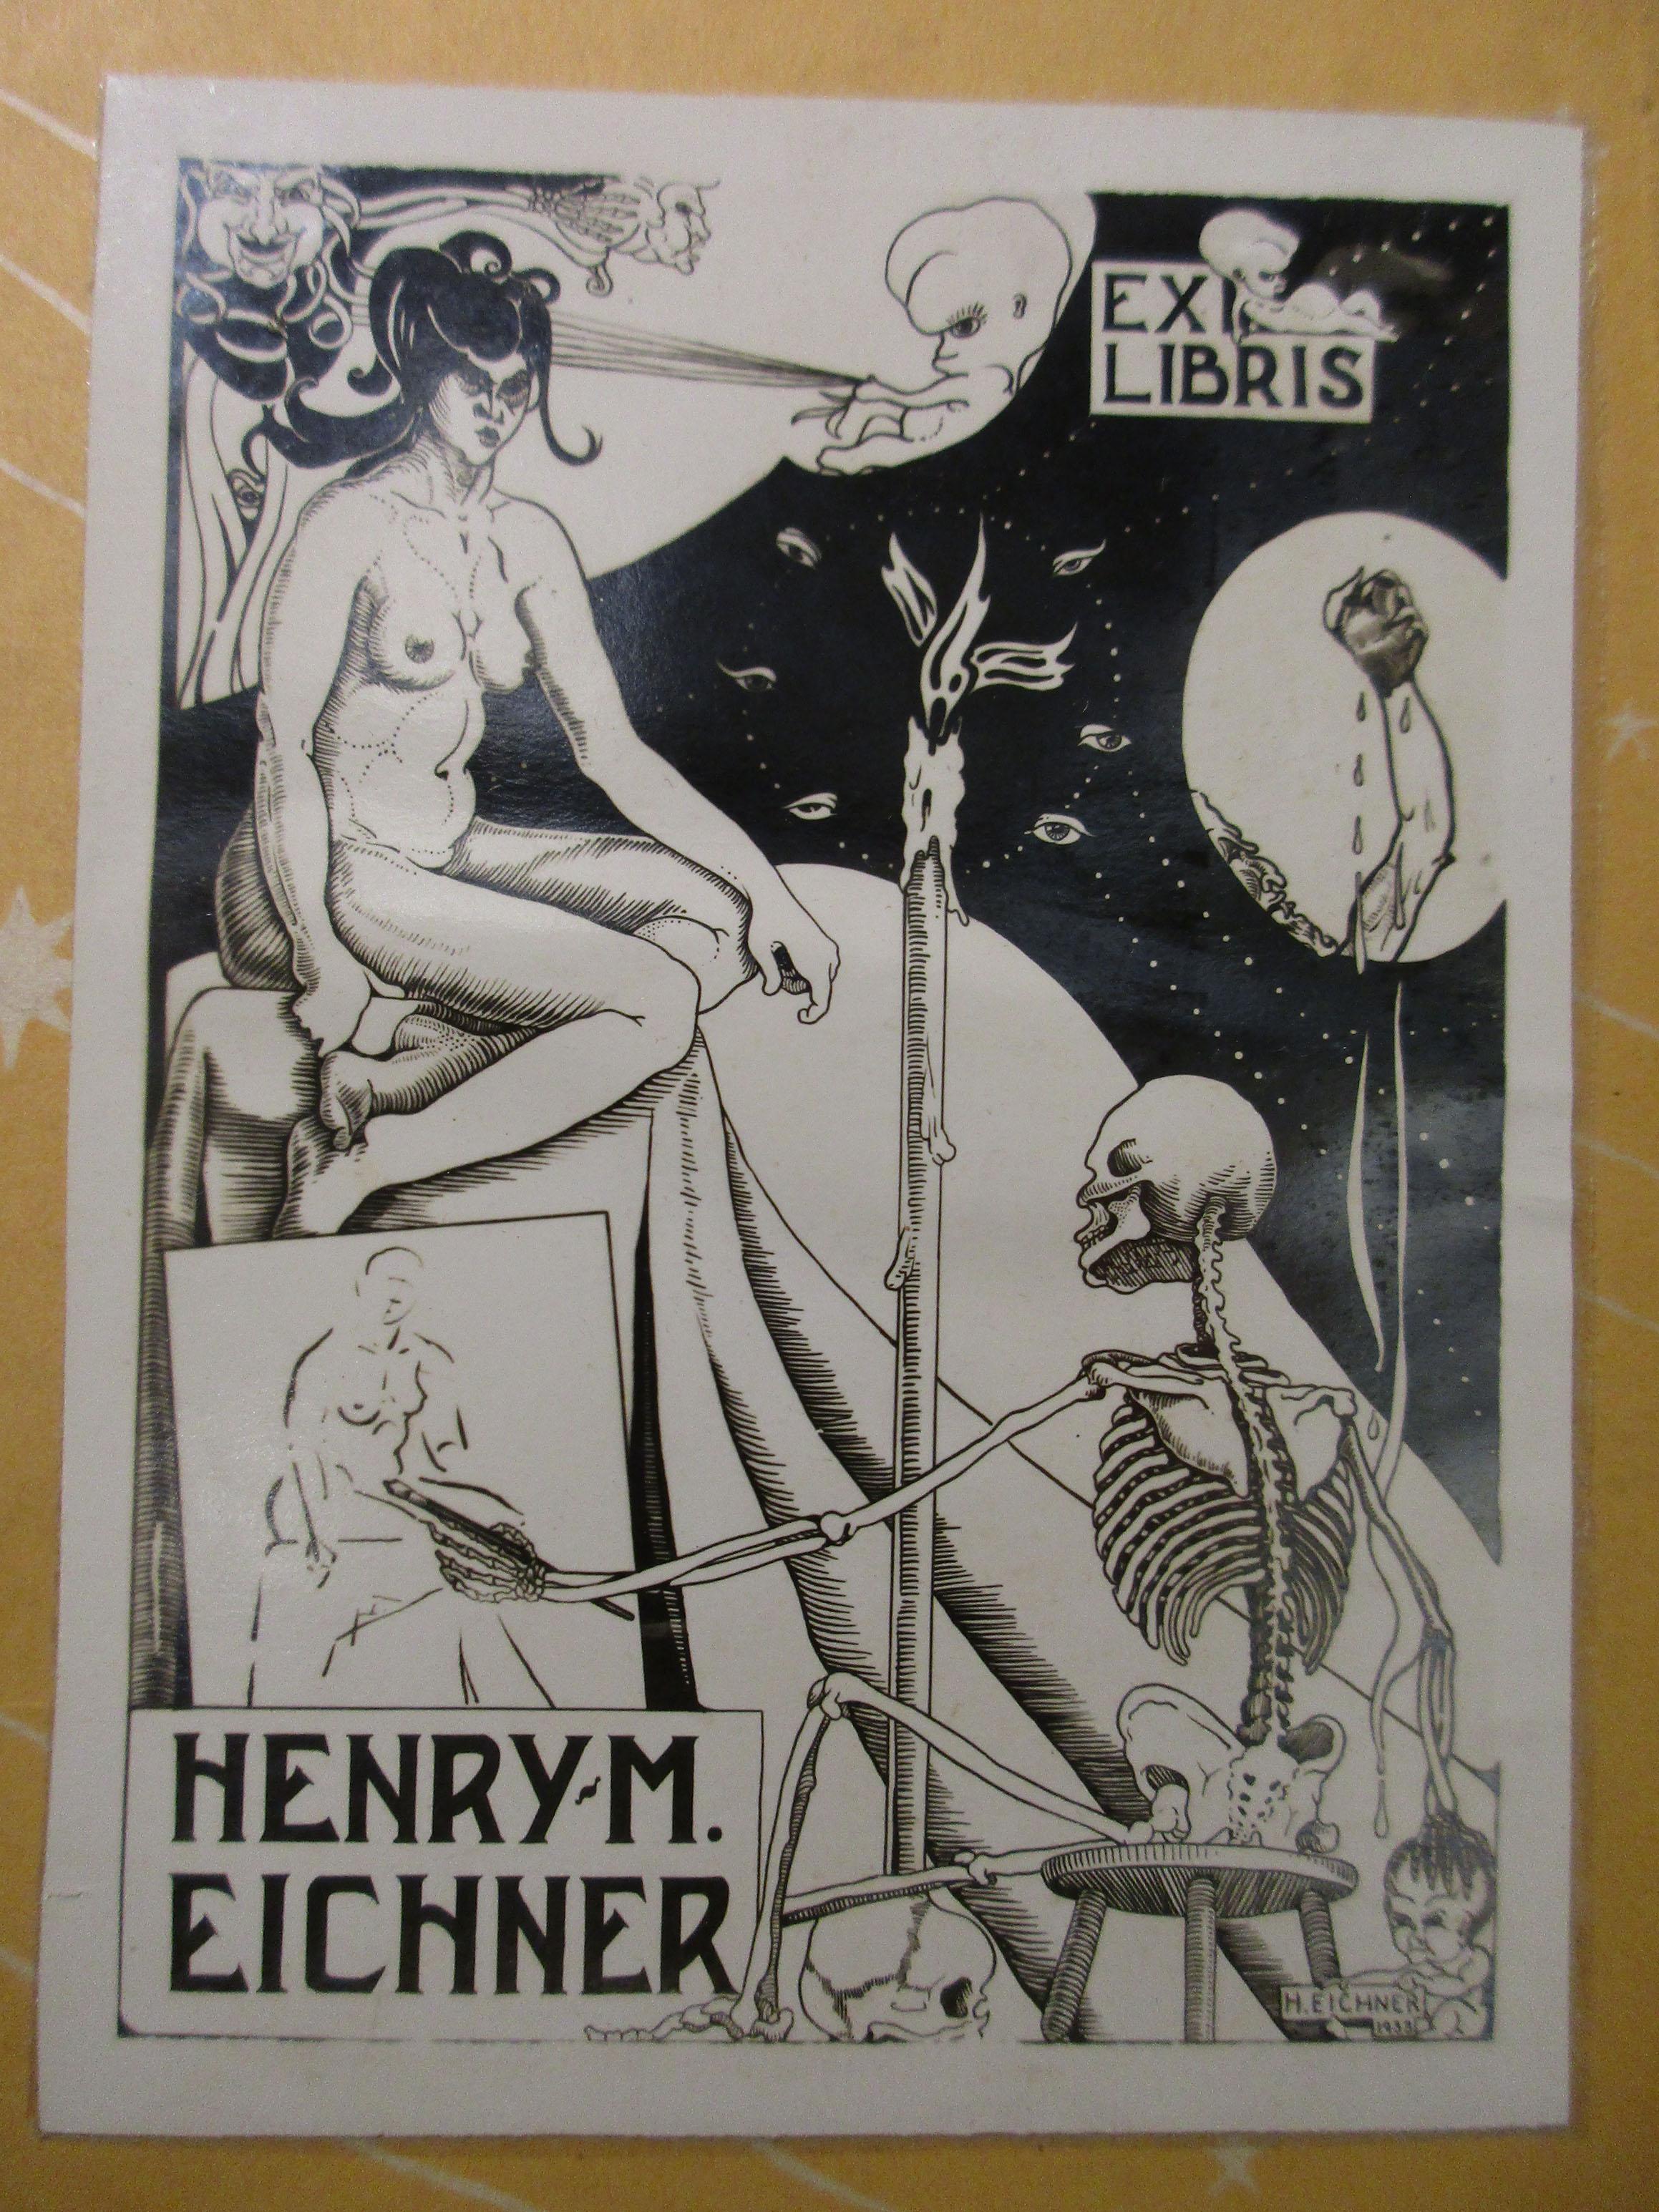 Bookplate of Henry M. Eichner (1933)